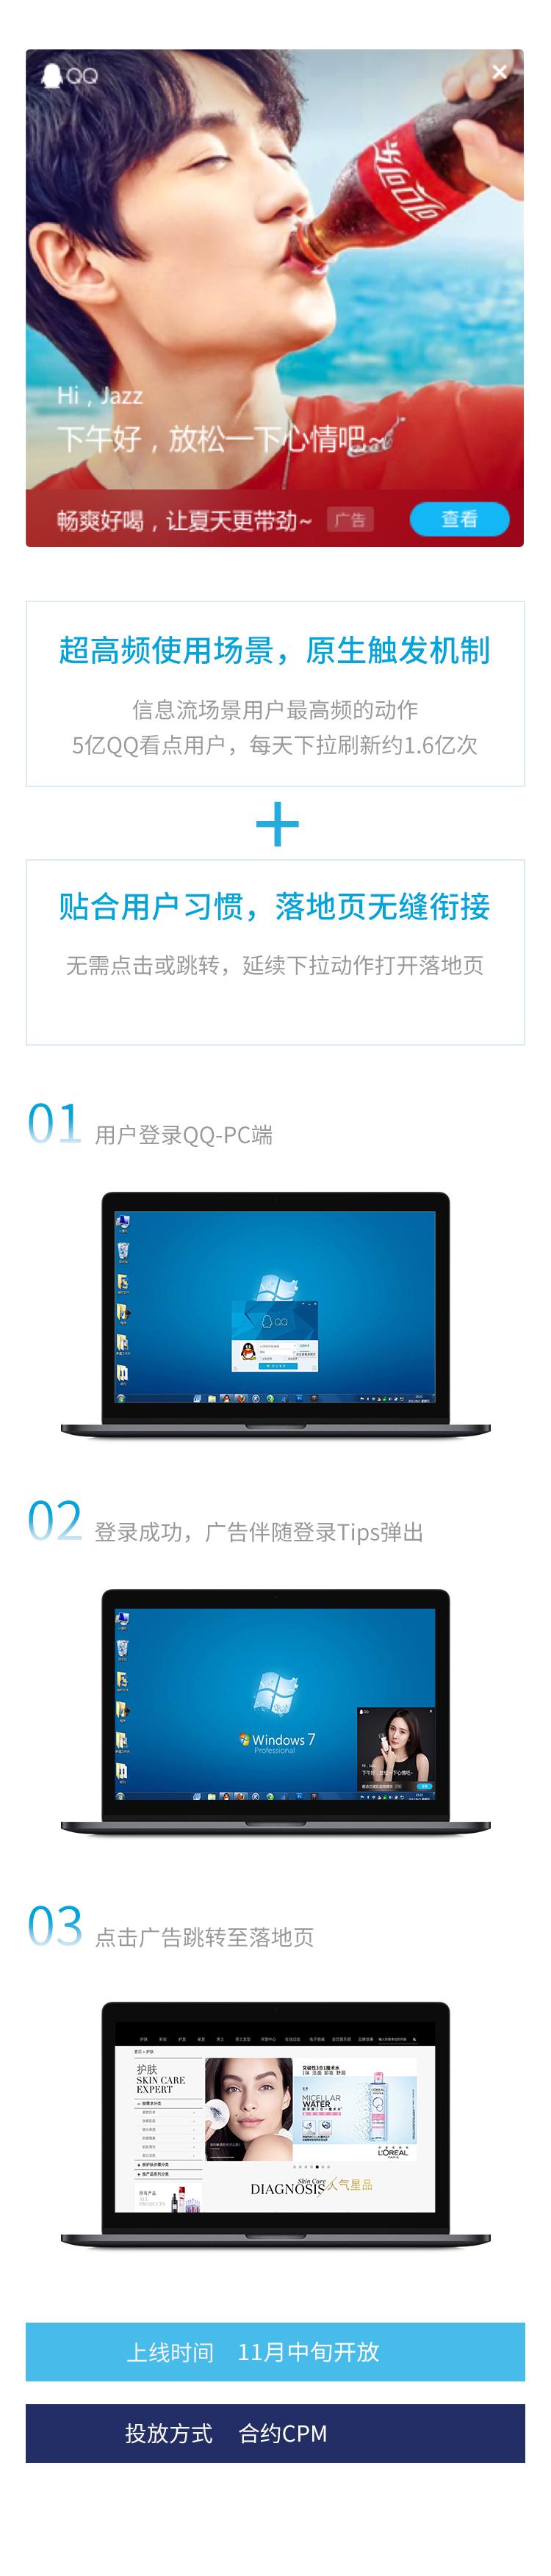 052 QQ-PC客户端_ 登录tips广告.jpg